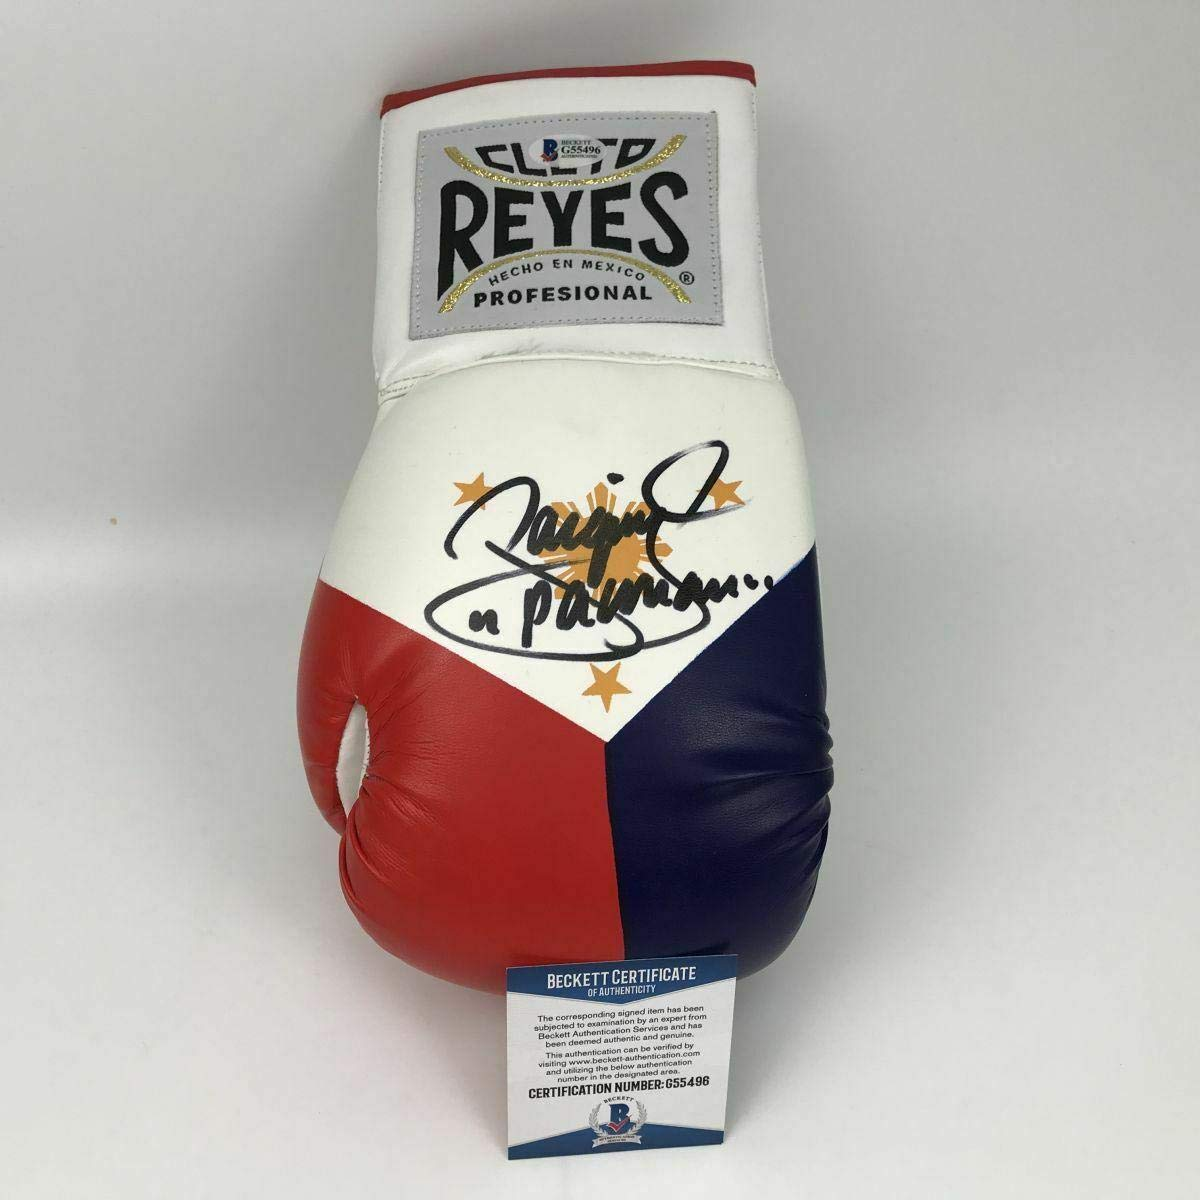 Autographed//Signed MANNY PAC-MAN PACQUIAO RWB Boxing Glove Beckett BAS COA Auto Beckett Authentication